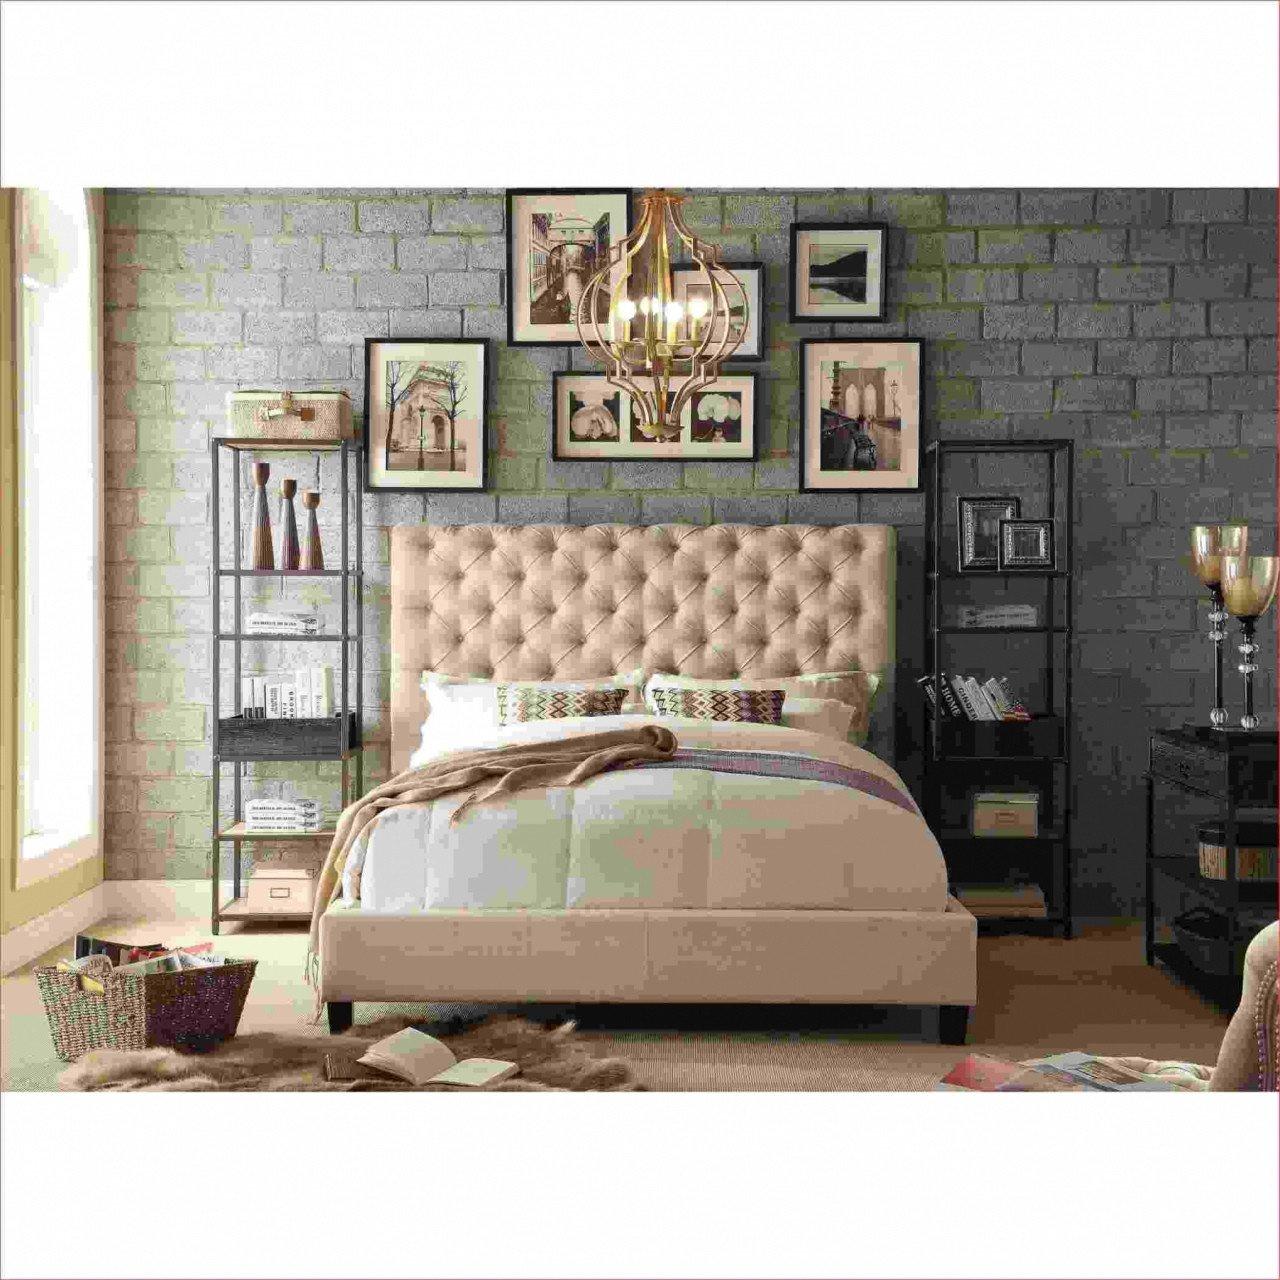 Bedroom Dressers On Sale Fresh solid Wood Bedroom Furniture — Procura Home Blog